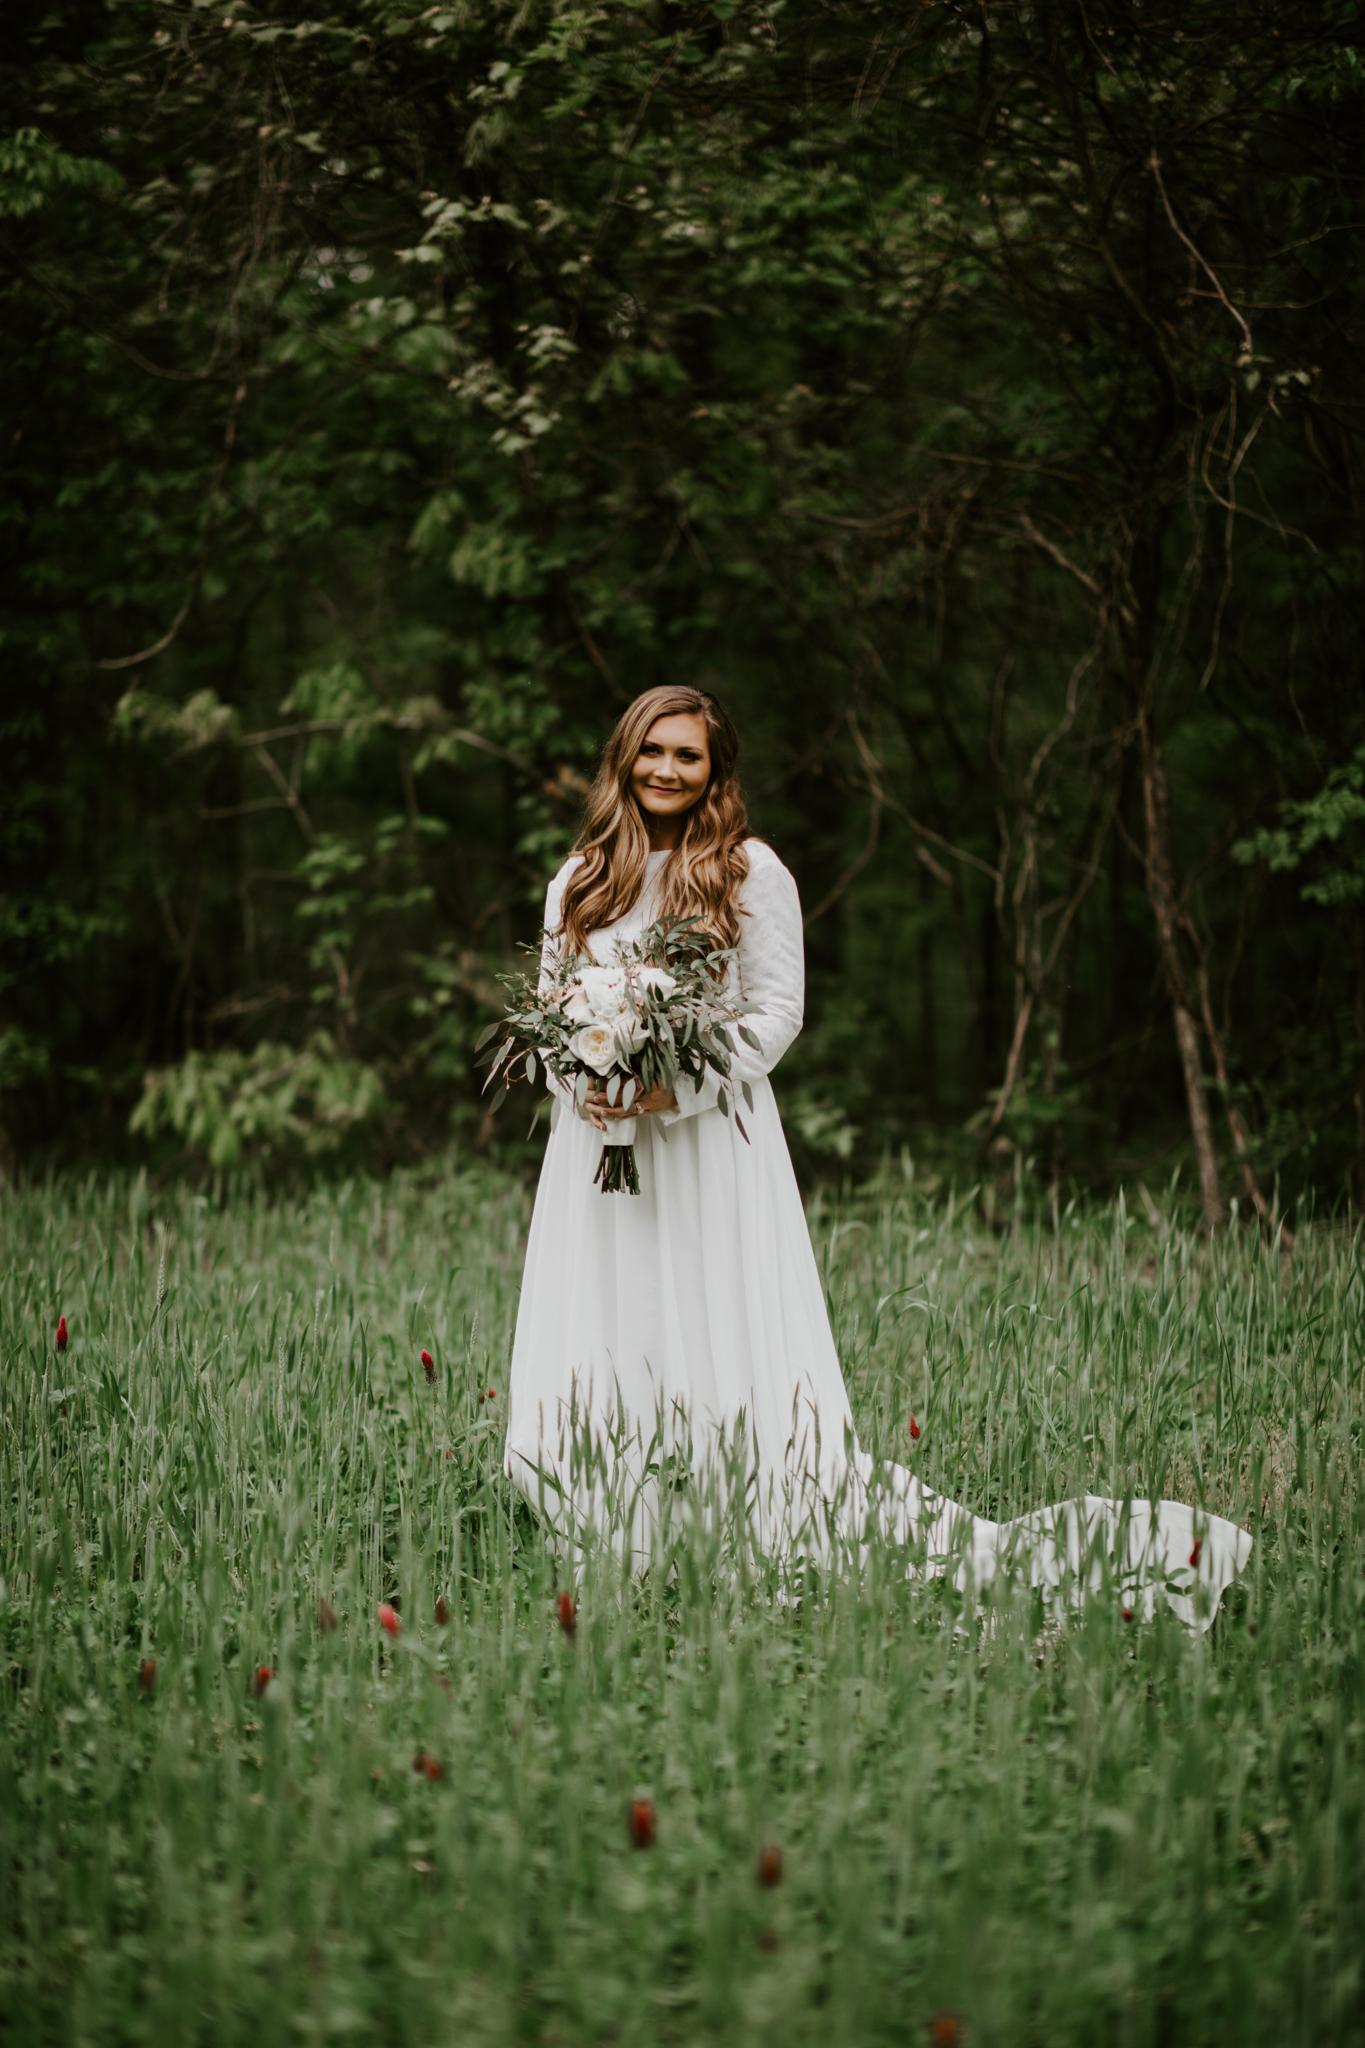 Lacey-Joe-Chattanooga-Nashville-Tennessee-Wedding-Elopement-Photographer-182.jpg